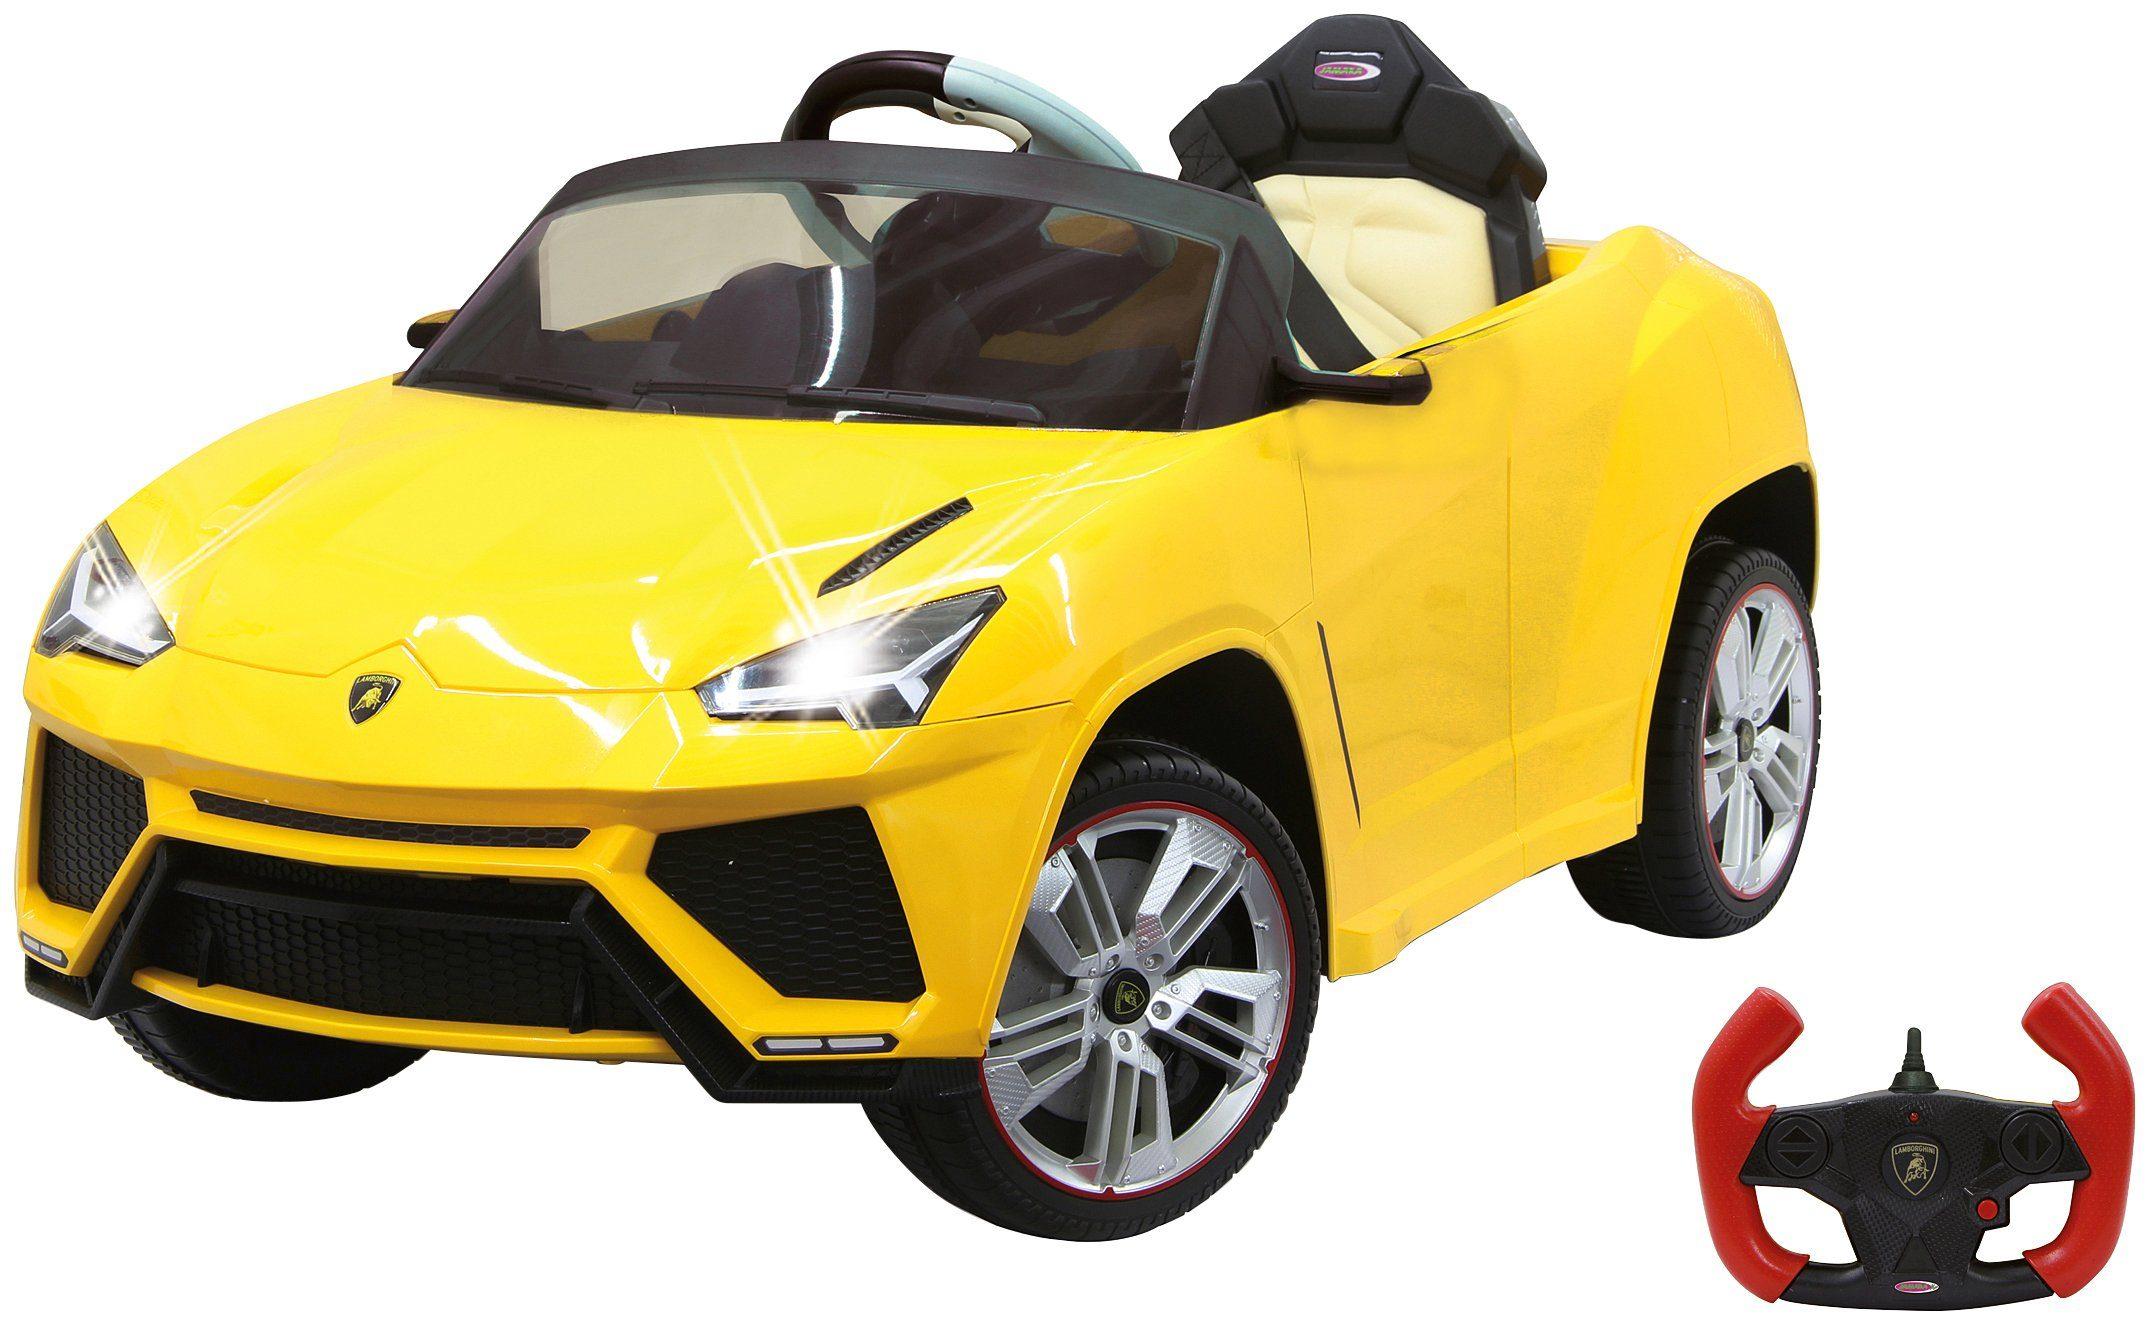 JAMARA KIDS Elektroauto »Ride-on Lamborghini Urus«, gelb, inkl. Fernsteuerung